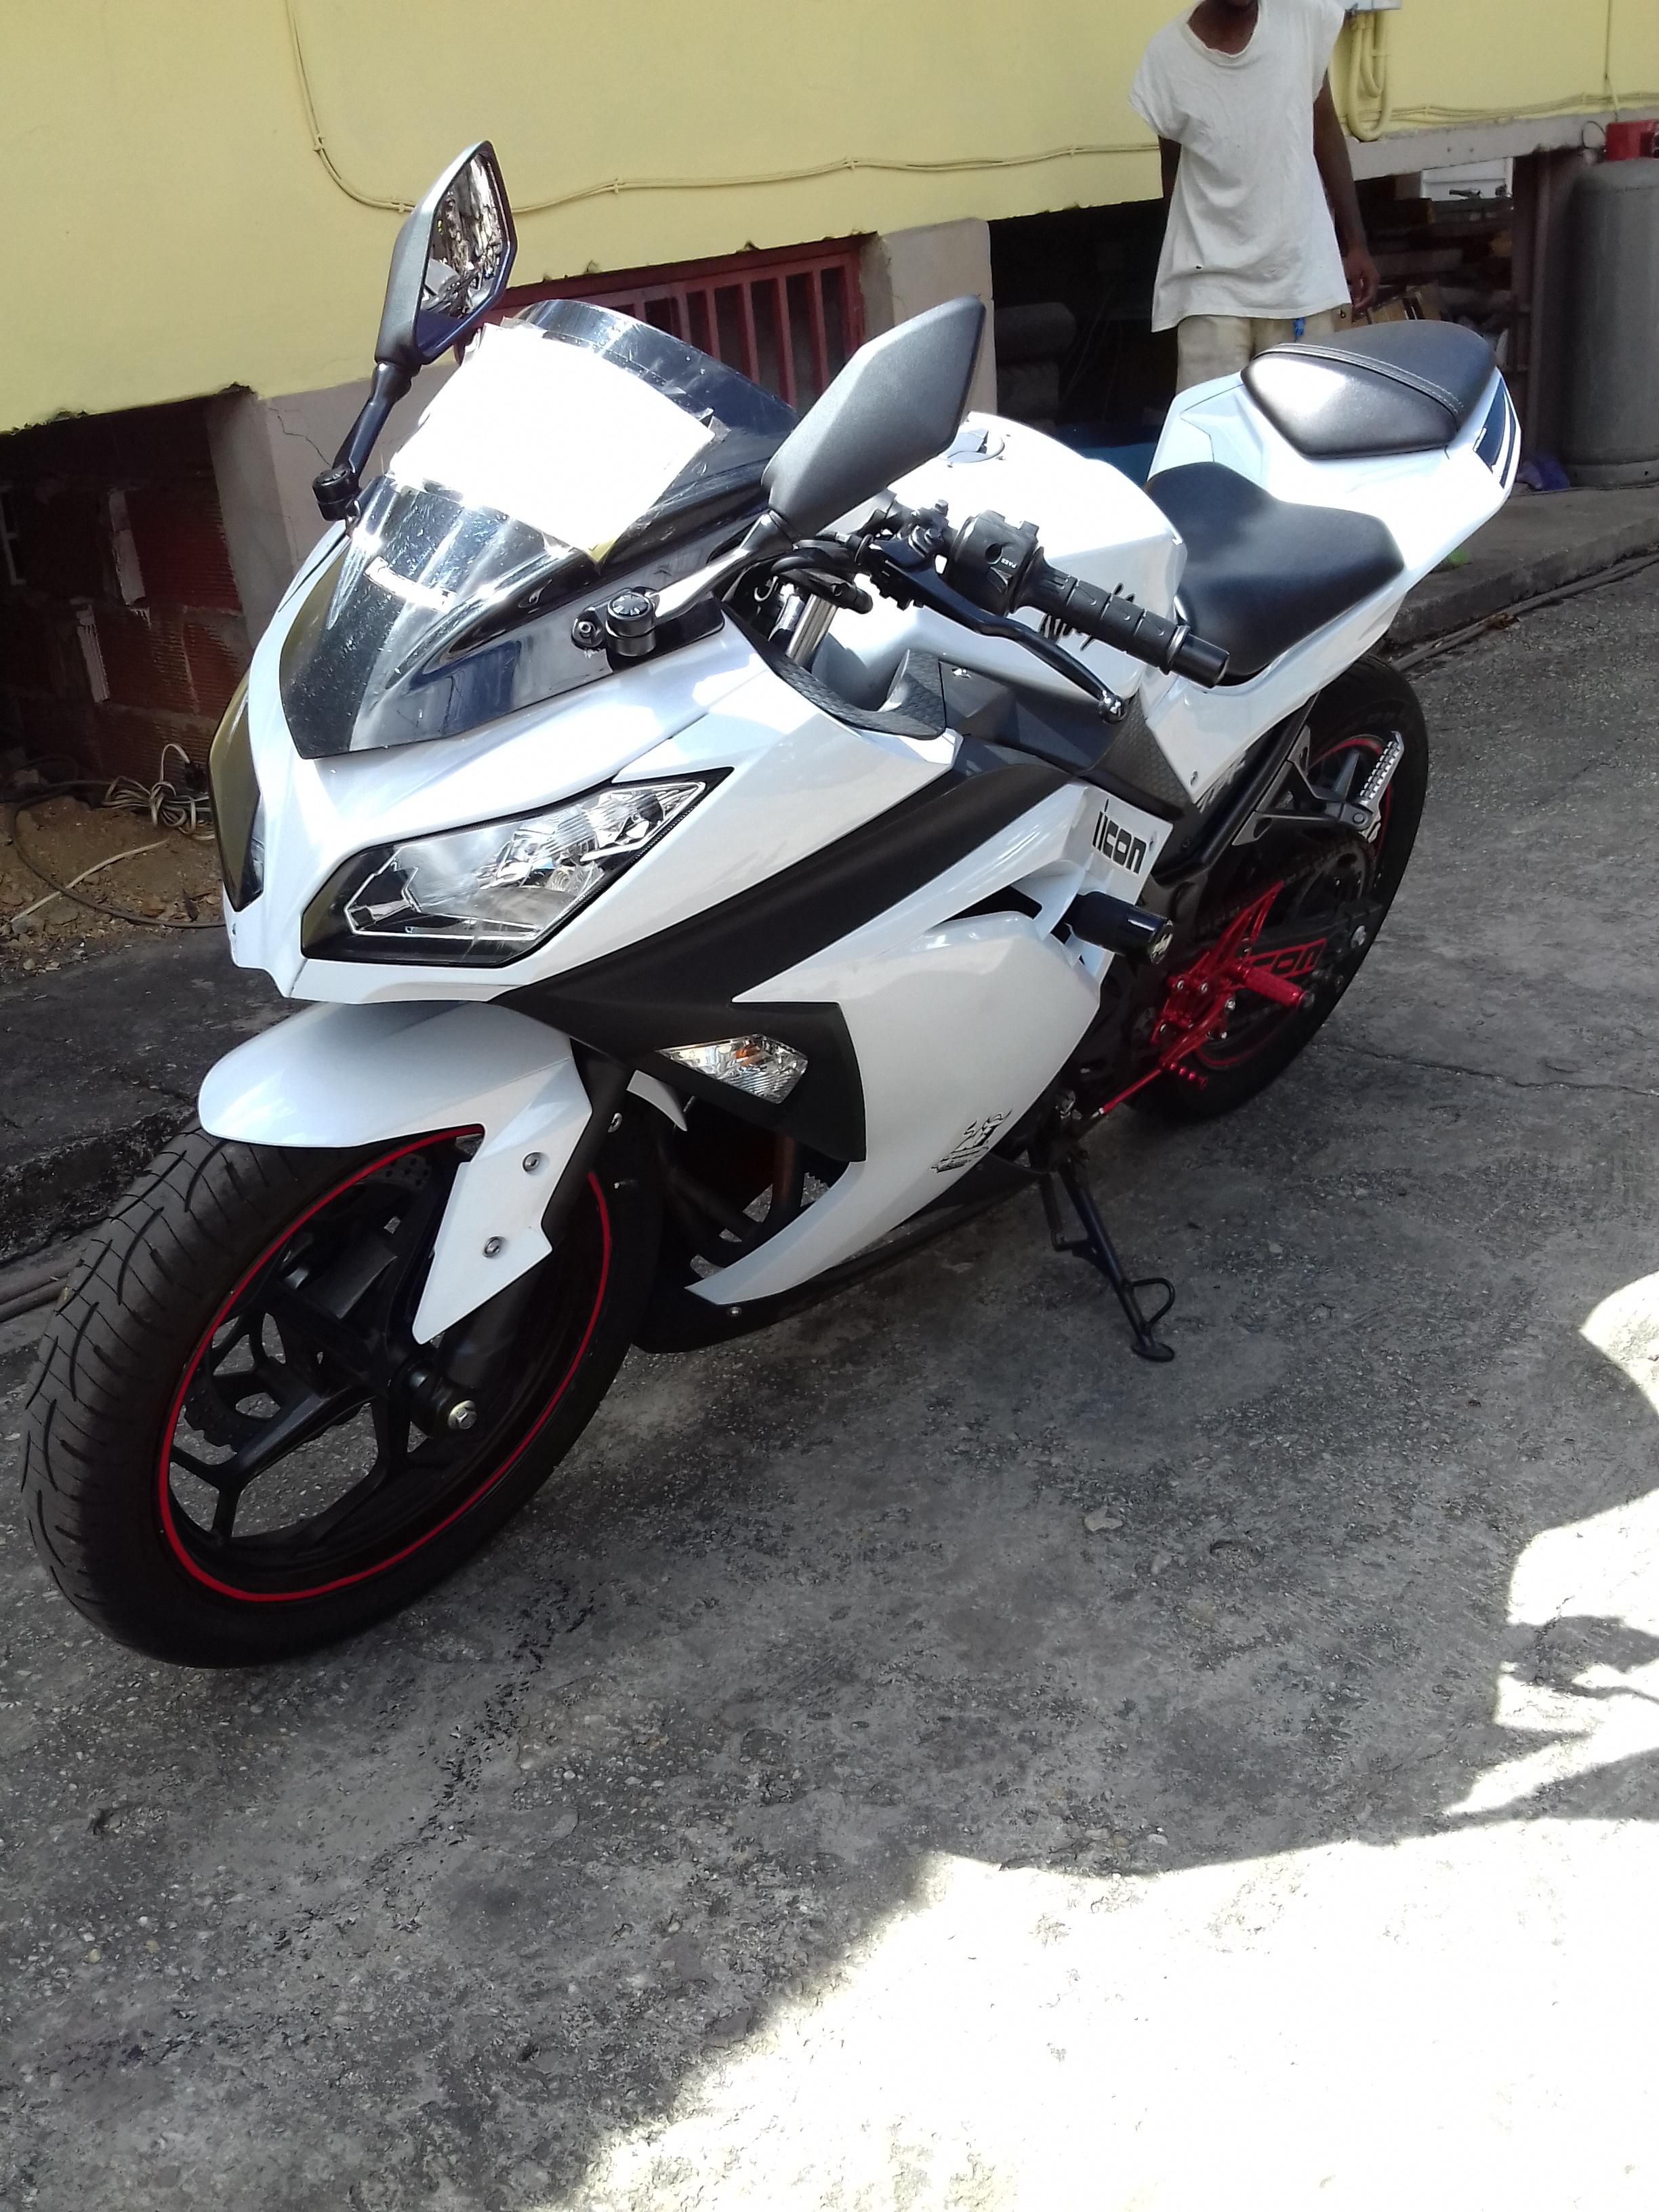 Kawasaki Ninja 300 Usedmotorcyclepartstt